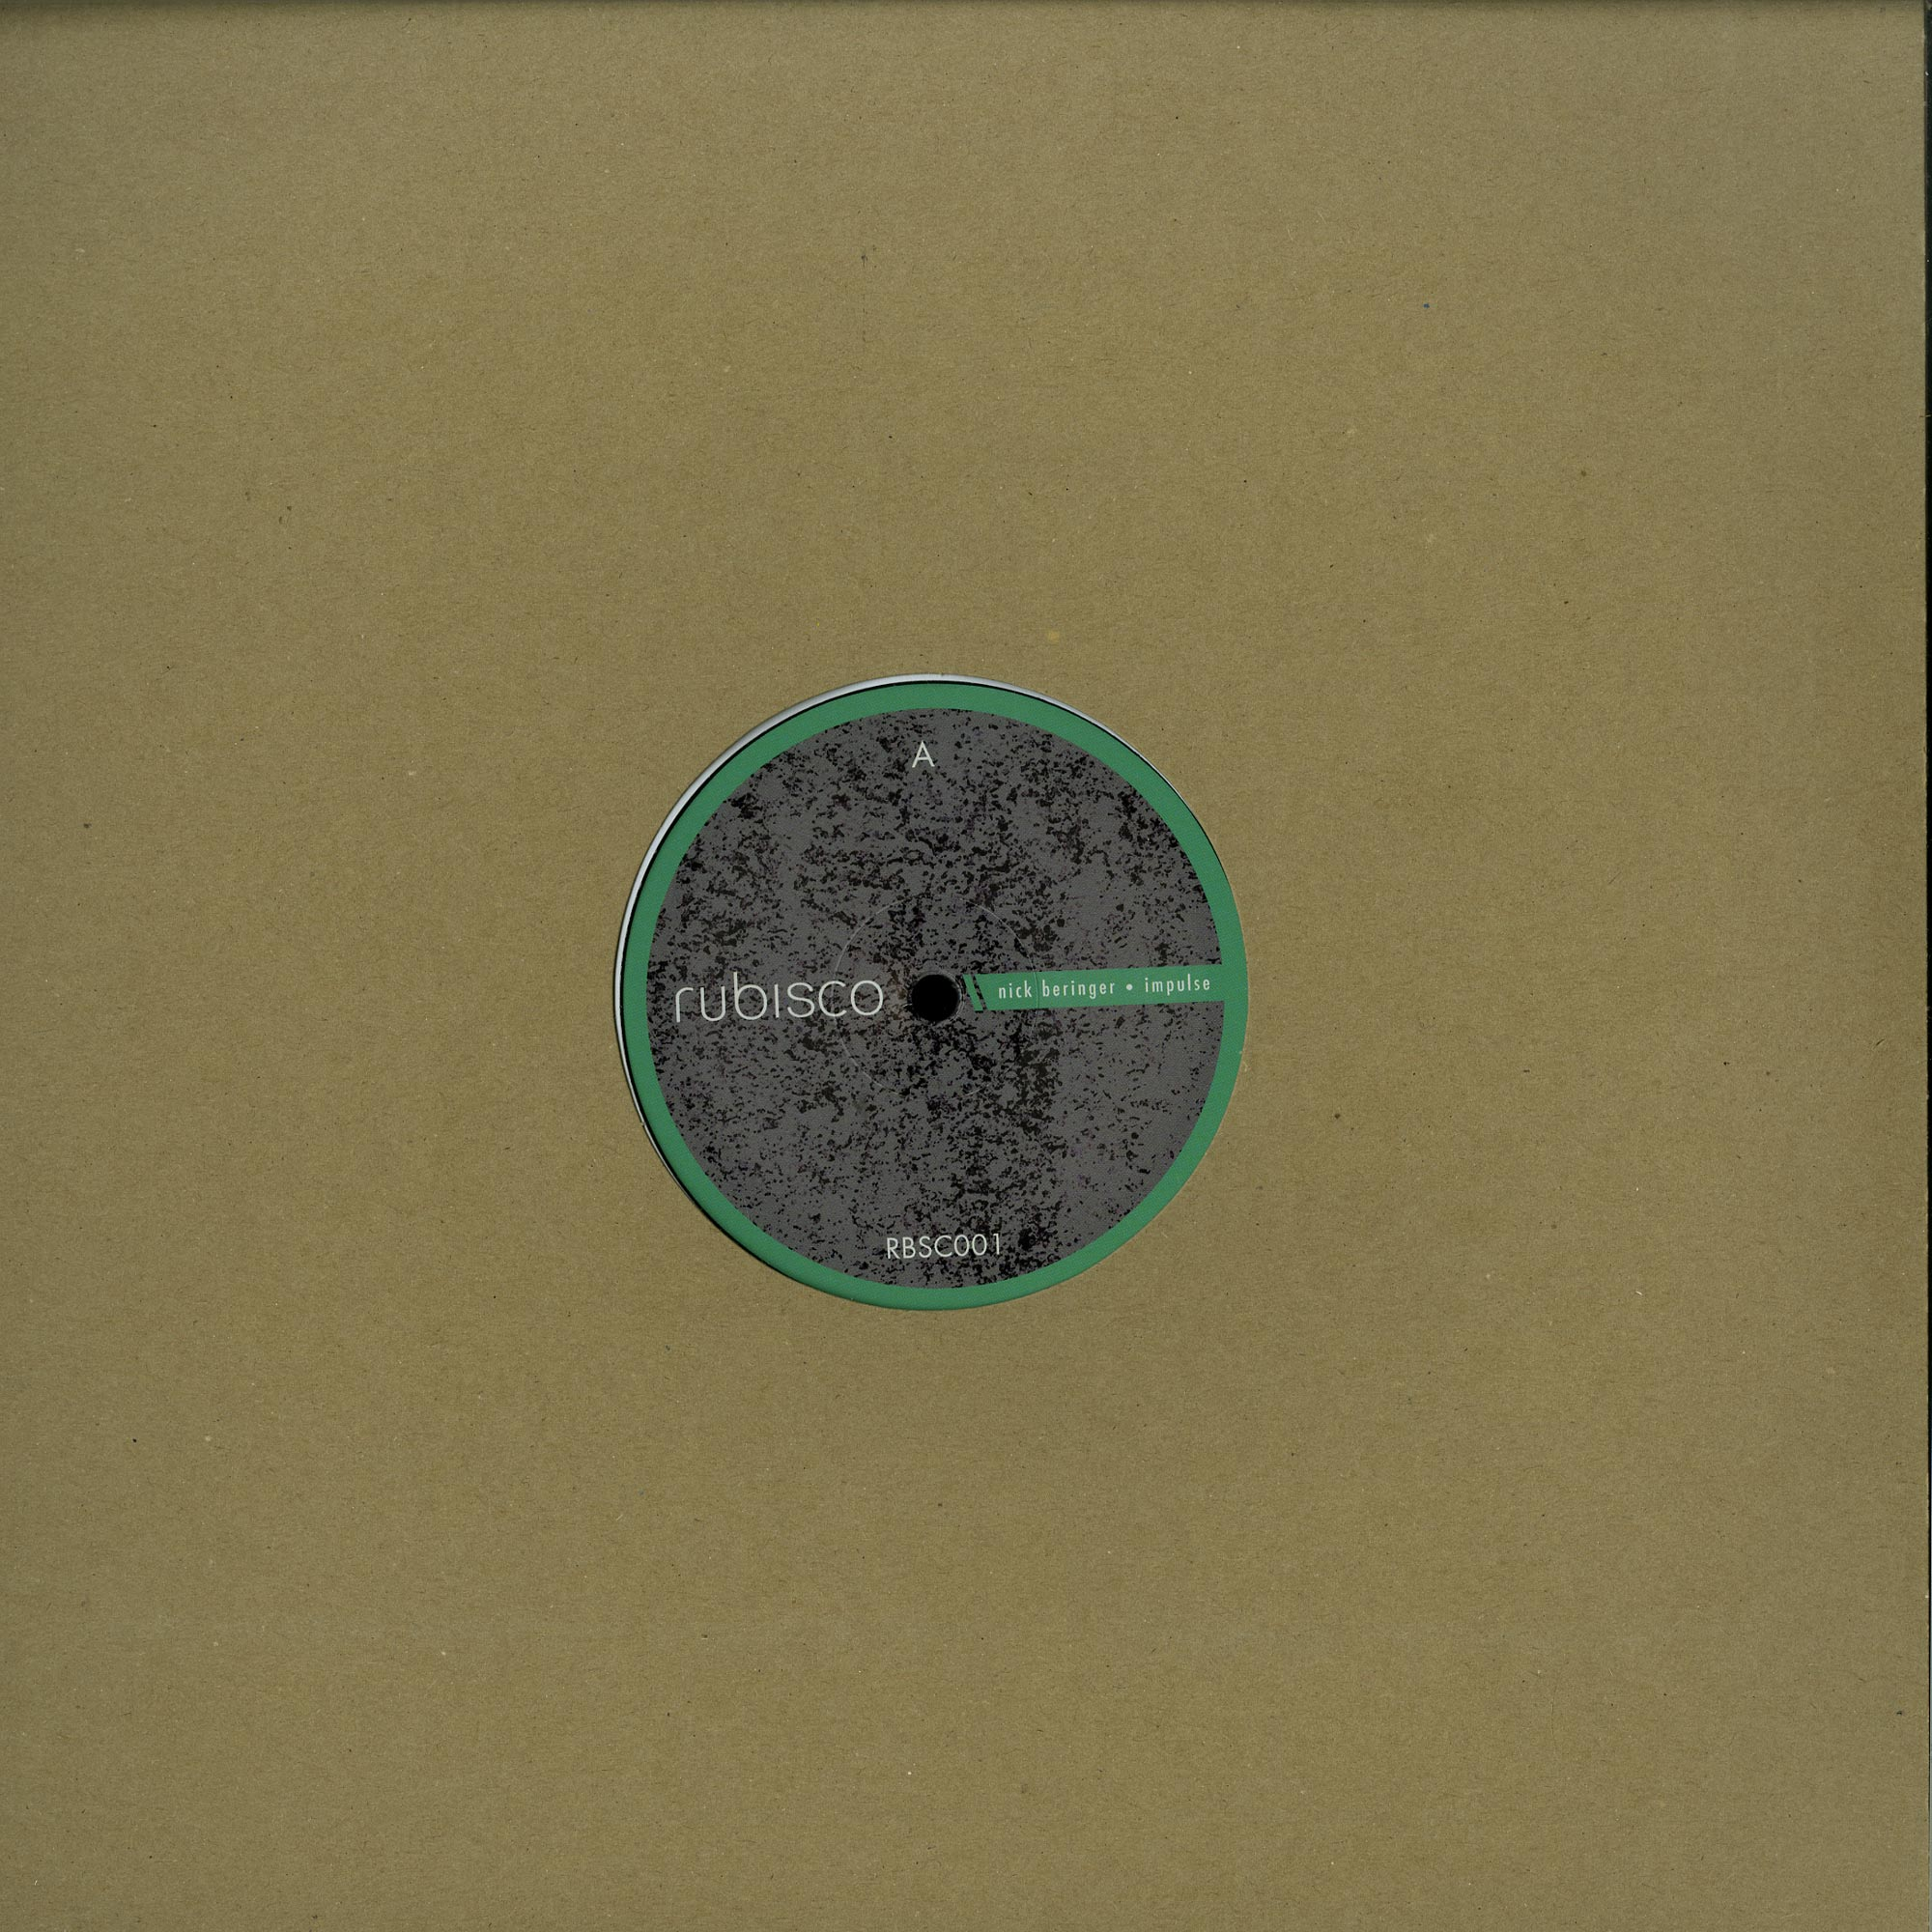 Nick Beringer - IMPULSE